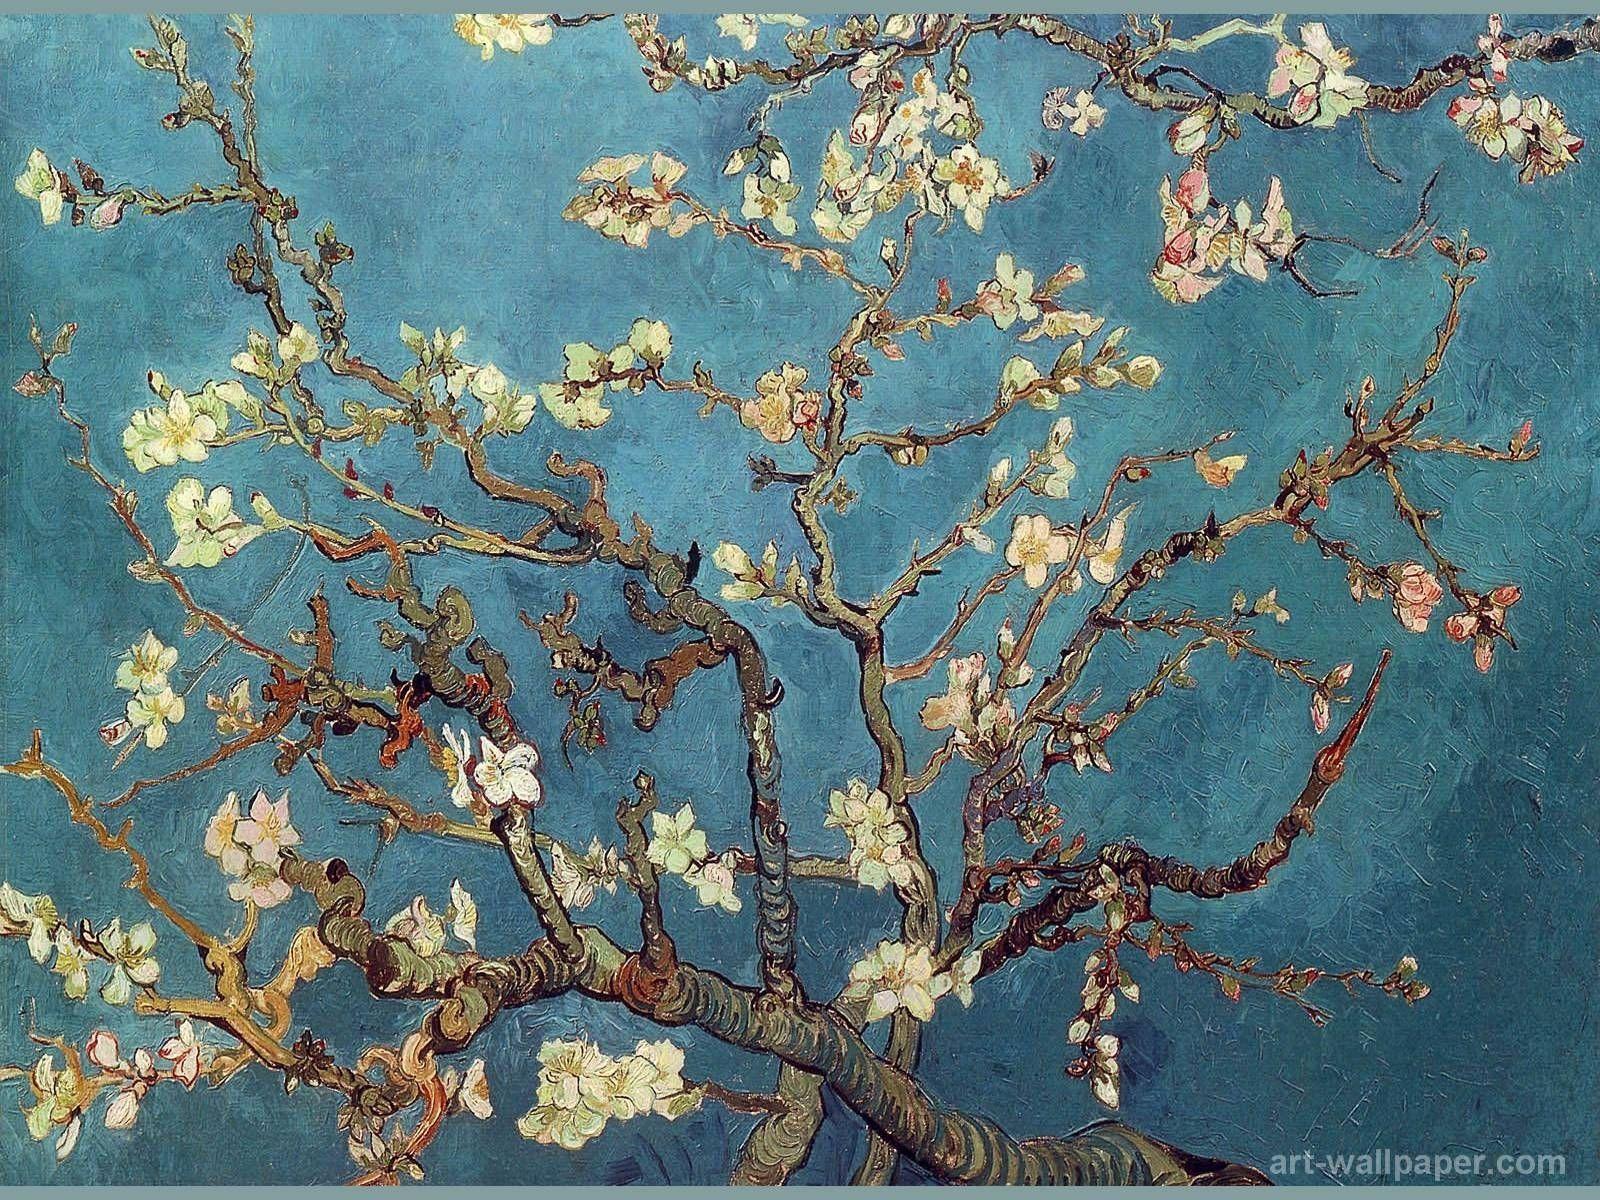 10 Latest Van Gogh Desktop Wallpaper Full Hd 1080p For Pc Background Van Gogh Flowers Van Gogh Almond Blossom Van Gogh Wallpaper